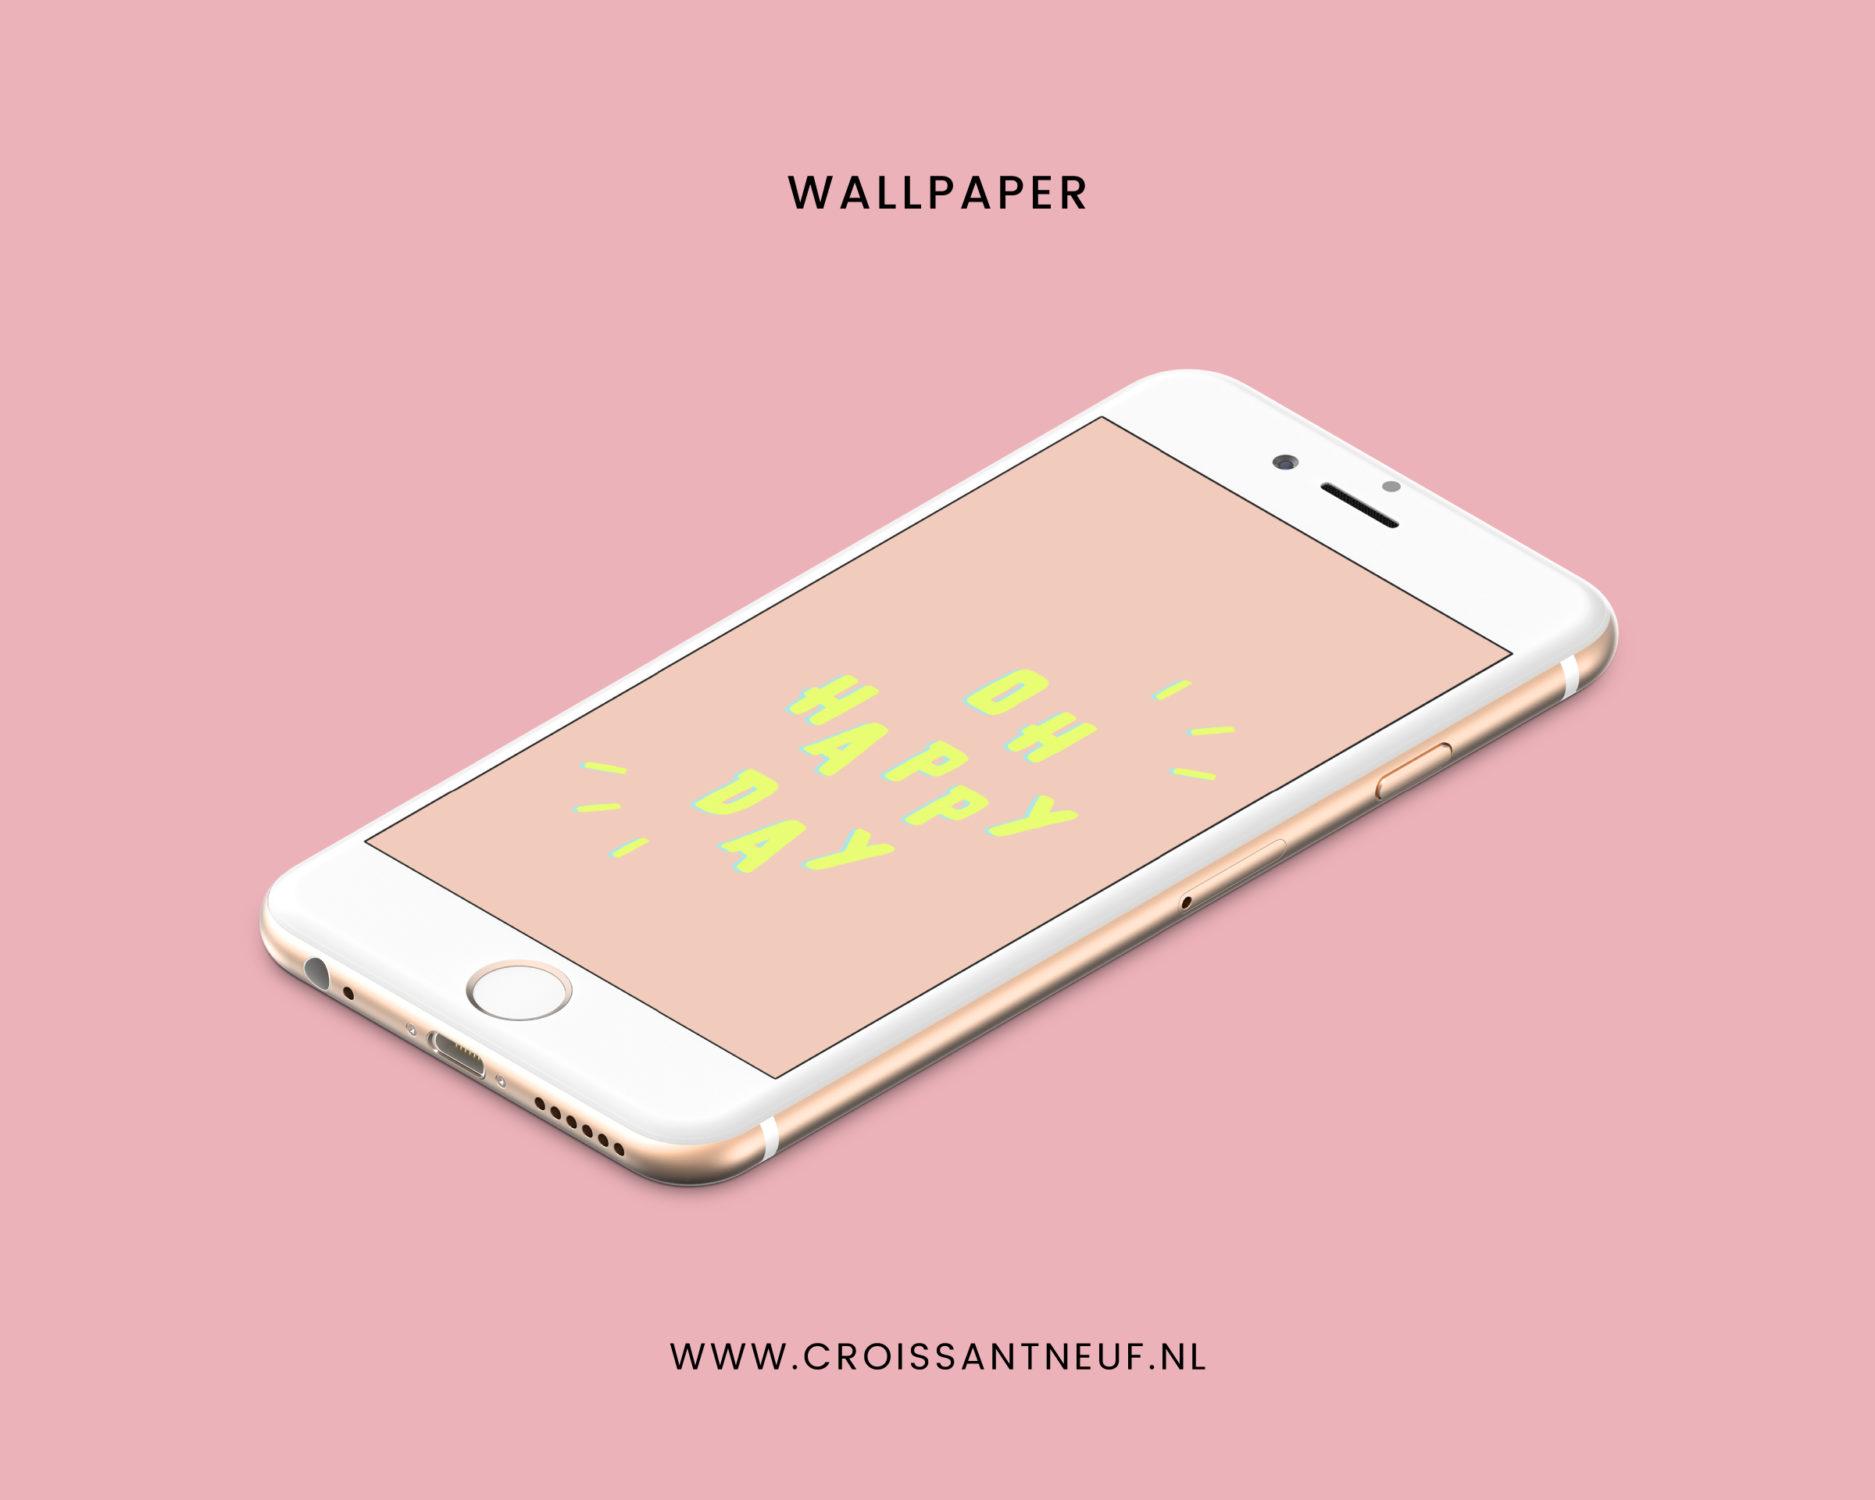 Wallpaper freebie blog